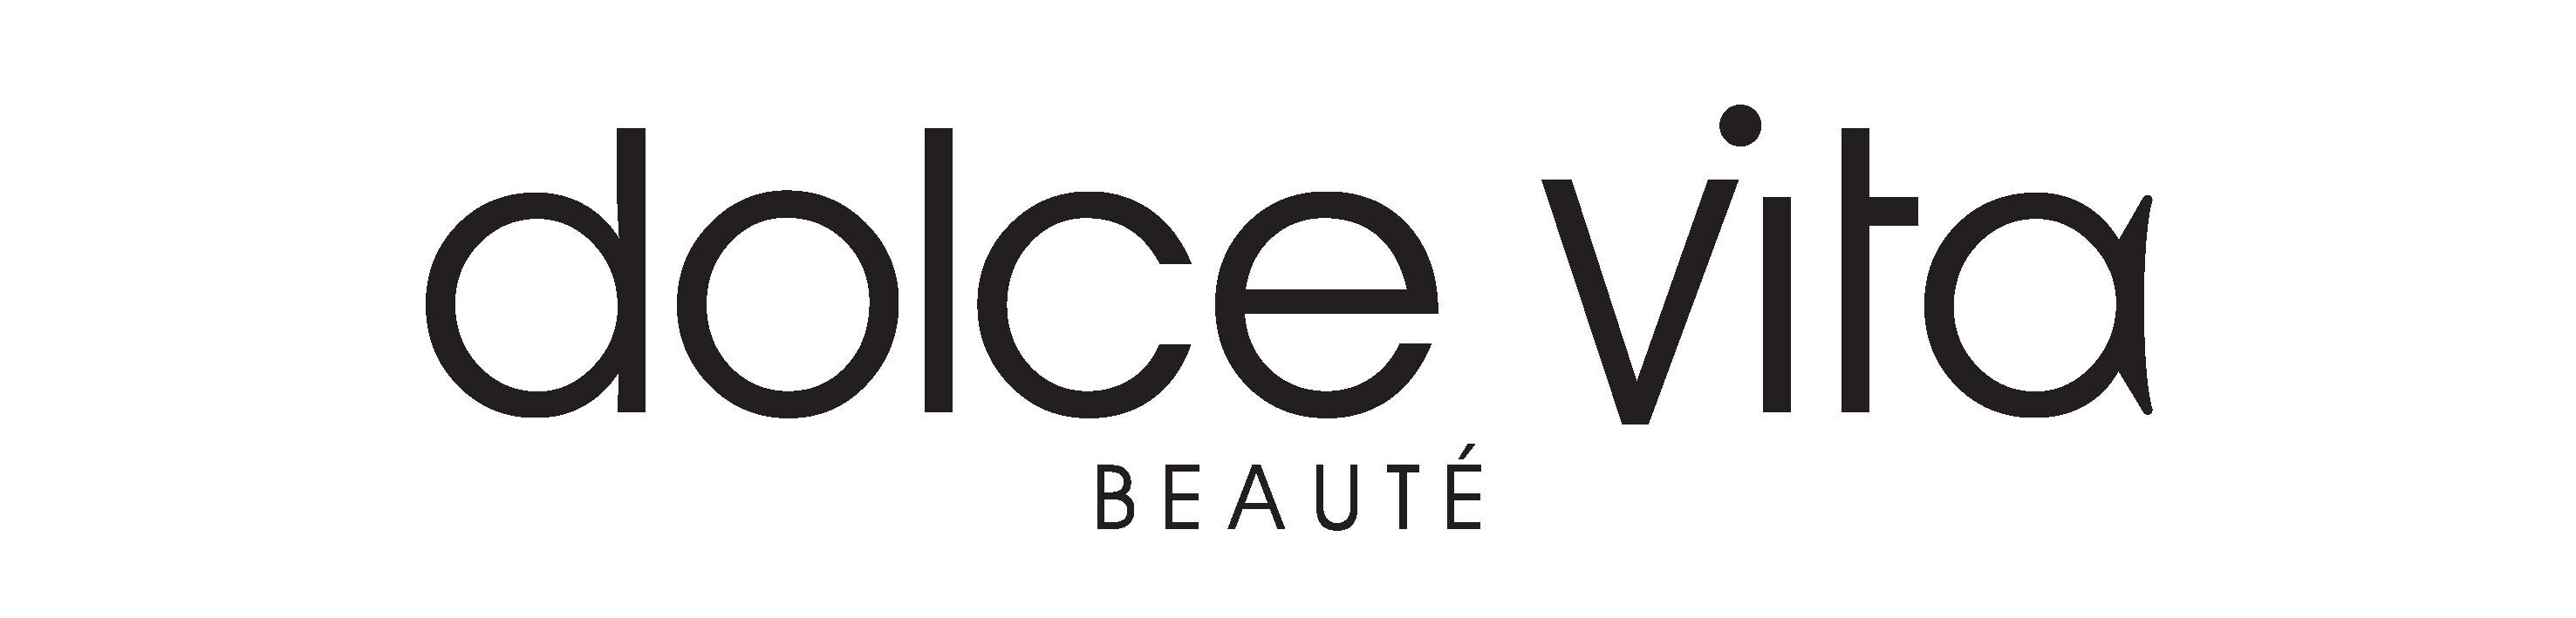 Dolce Vita Beauté New Logo